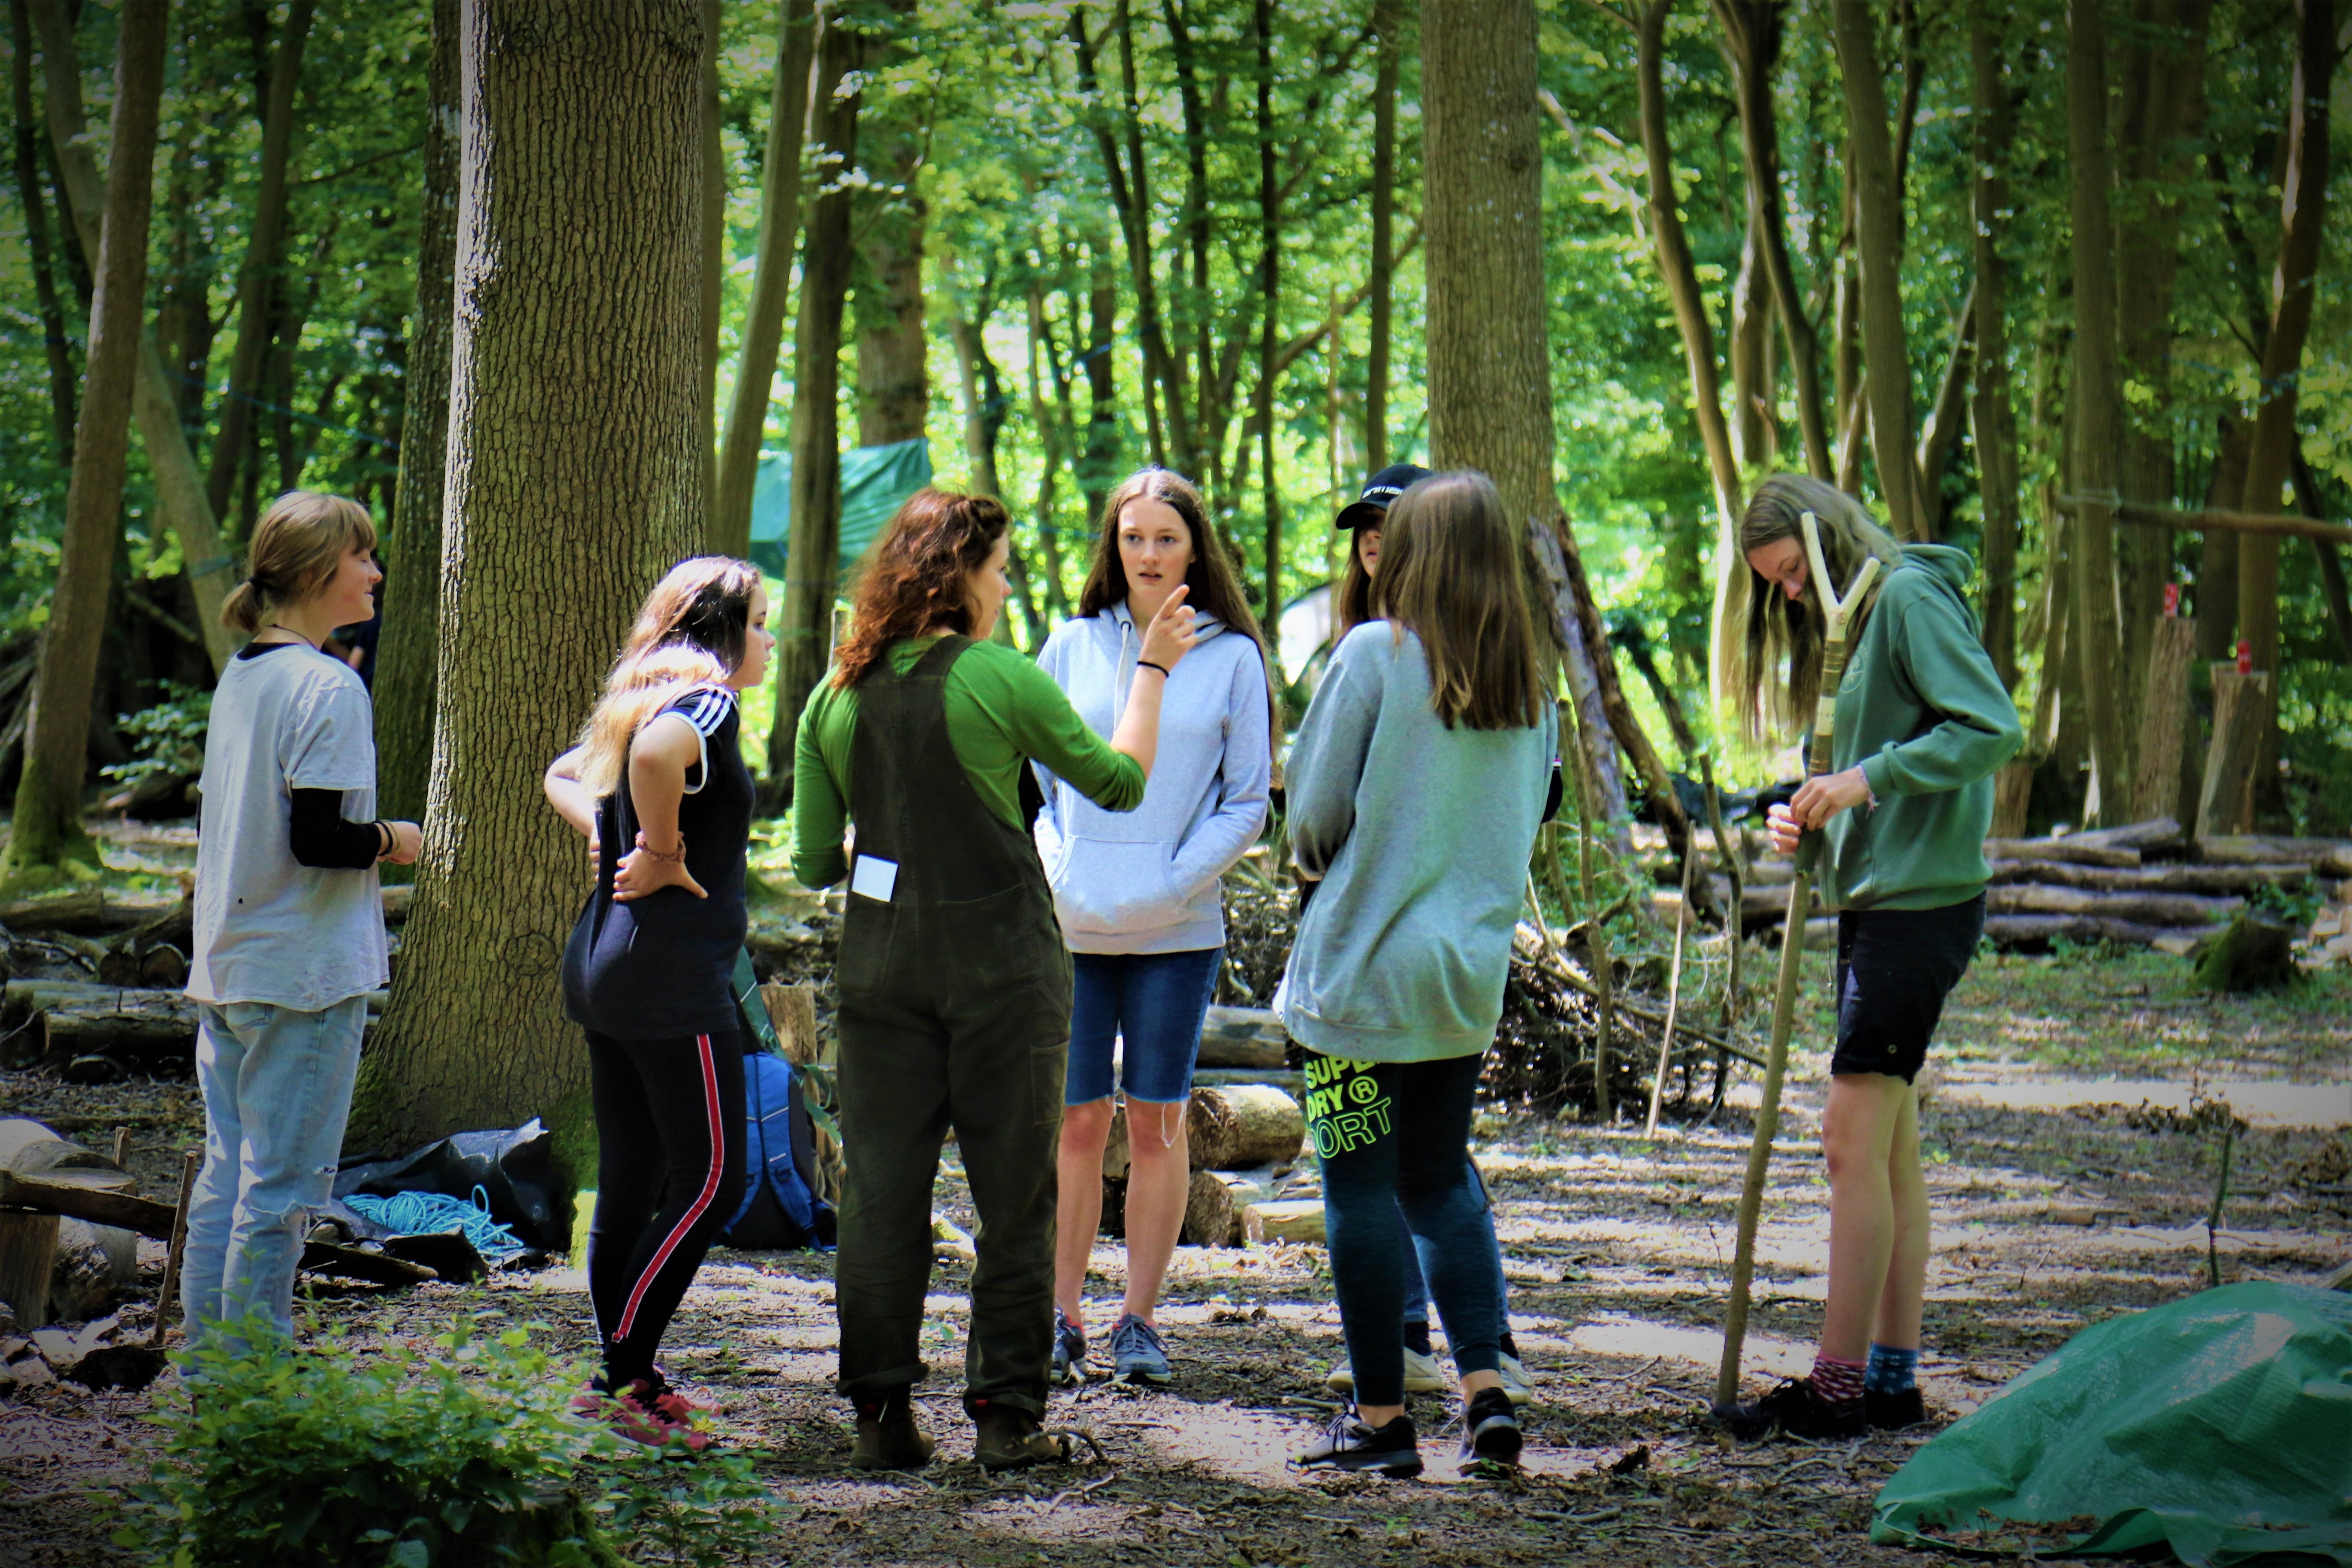 Earth Steward Apprenticeship (ESA) Junior camp mentored by Phil Greenwood